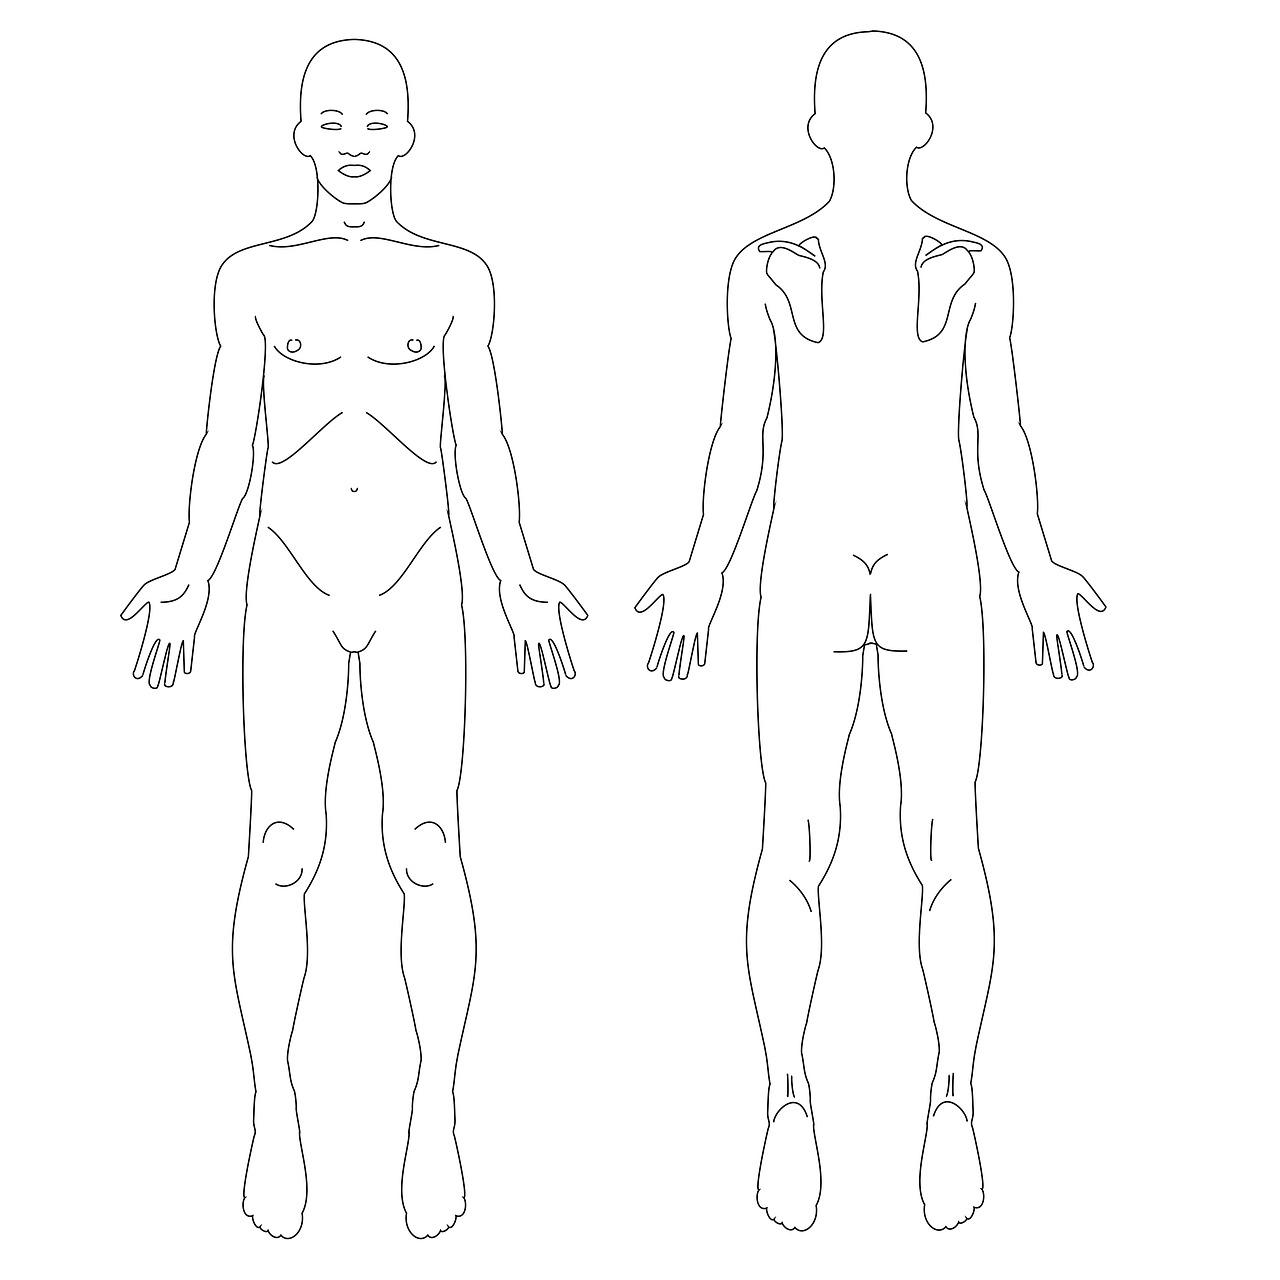 males-1859518_1280